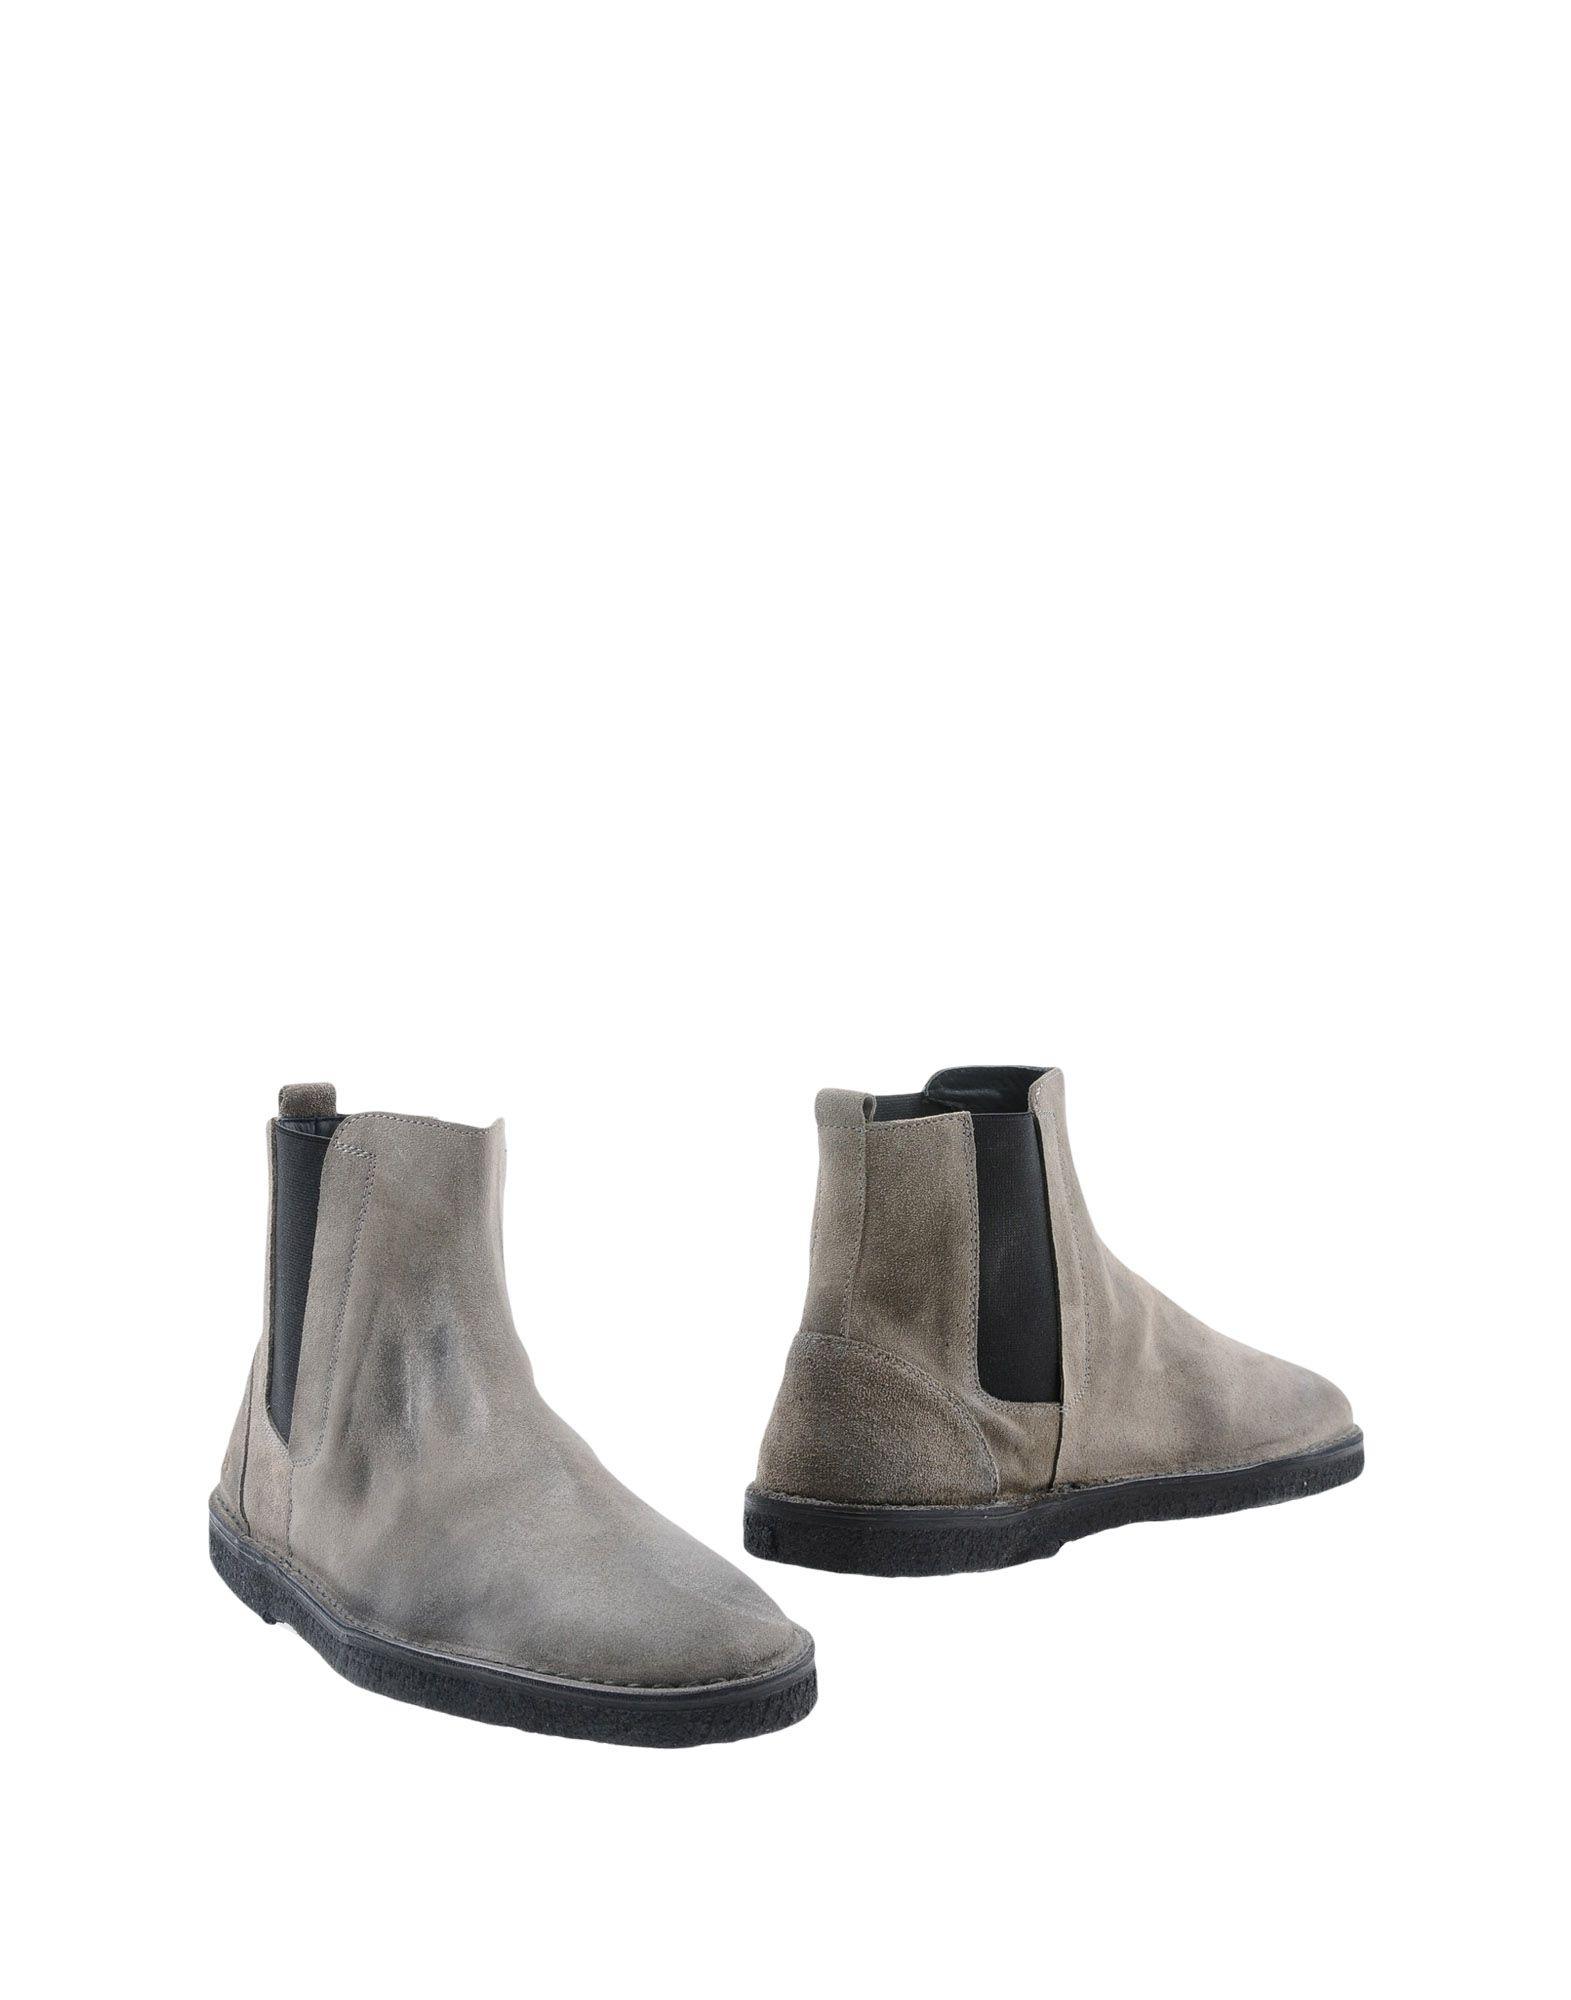 Golden Goose Deluxe Brand Stiefelette Herren  11341375ET Gute Qualität beliebte Schuhe